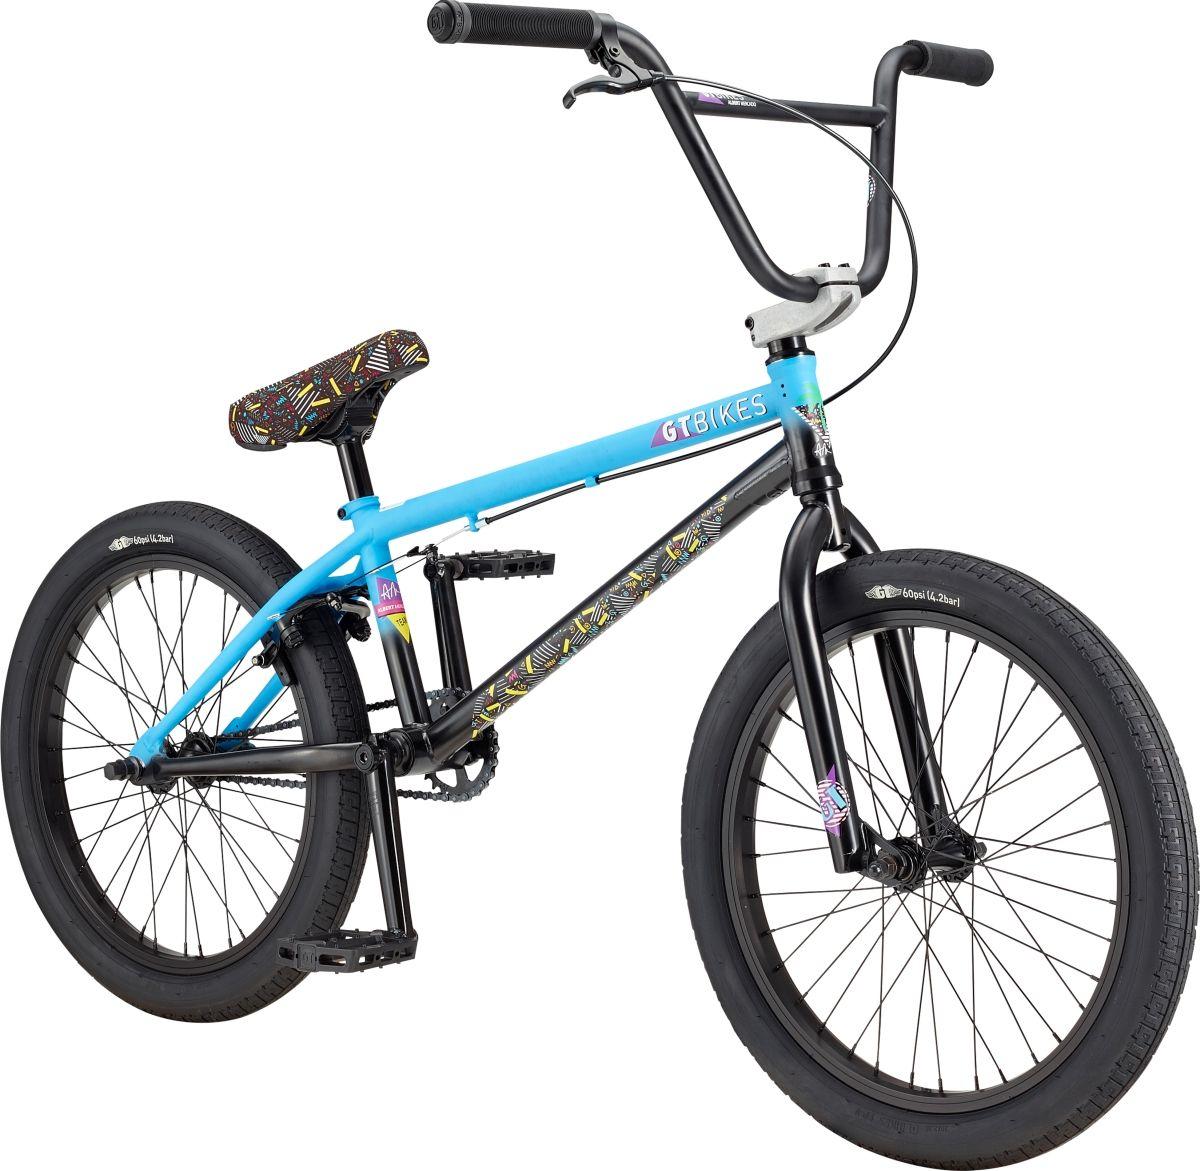 Gt Albert Mercado Team 20 Inch Bmx Bike 2019 - £349.99 | BMX Bikes ...